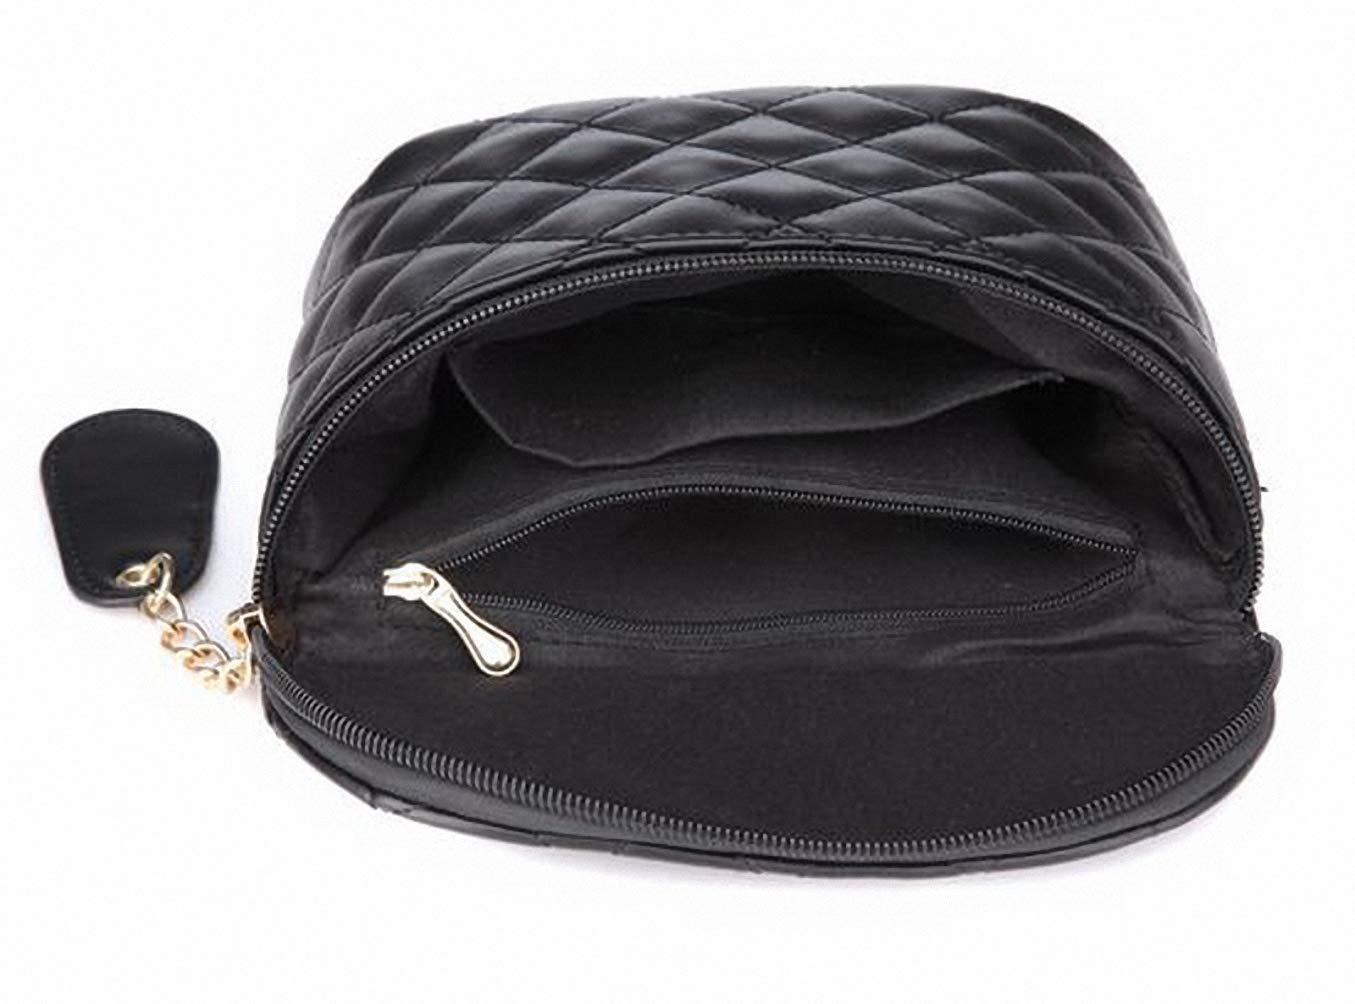 Leather Waist Packs Luxury Women Waist Bags Star Style Small Fashion Bag Black